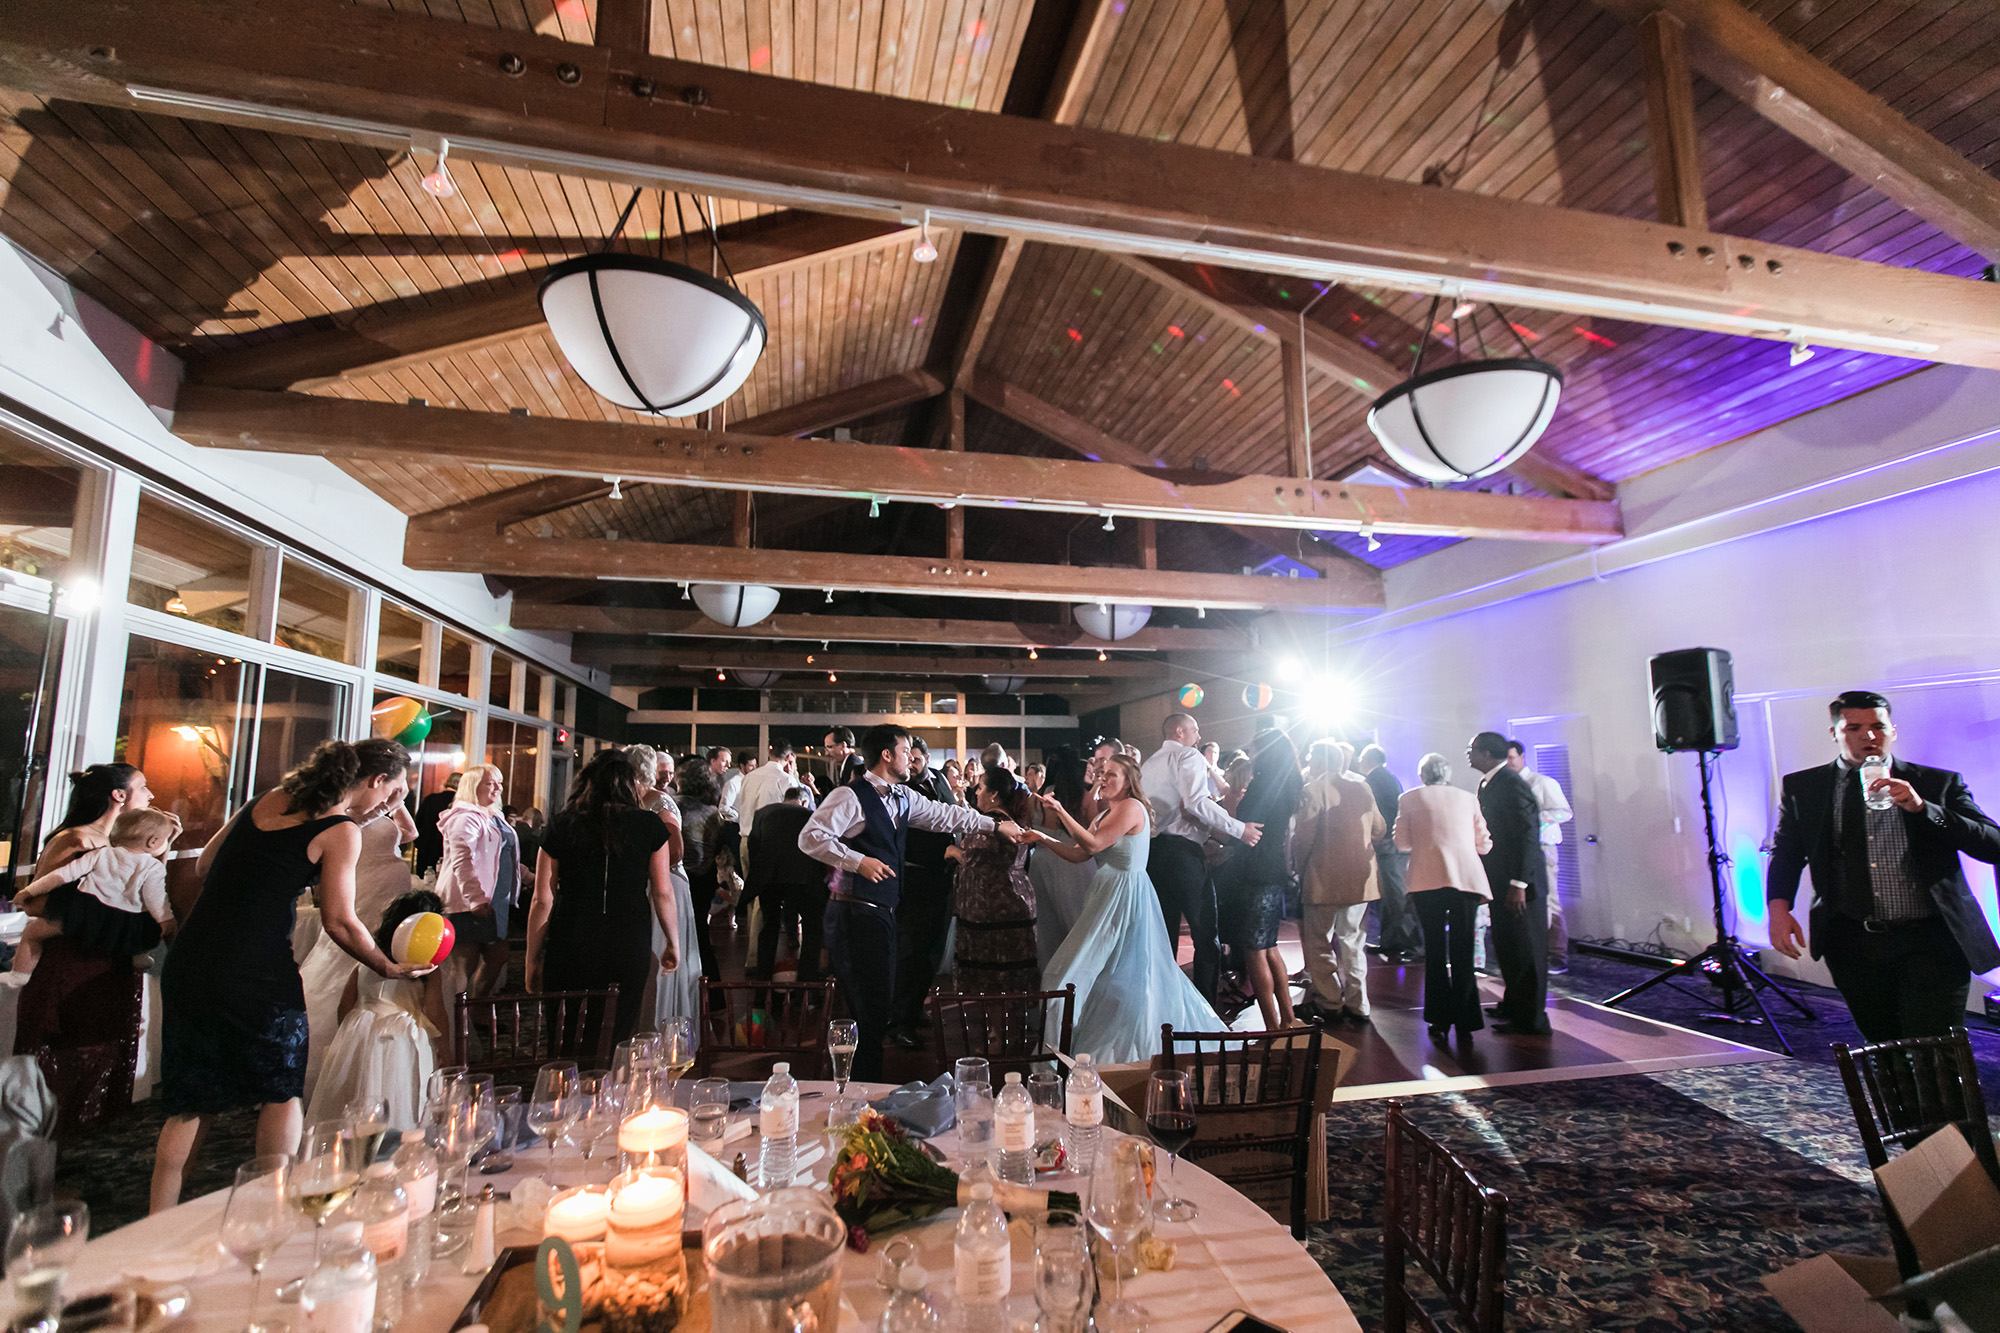 unforgettable-st-monica-wedding-carrie-vines-photography-127.jpg